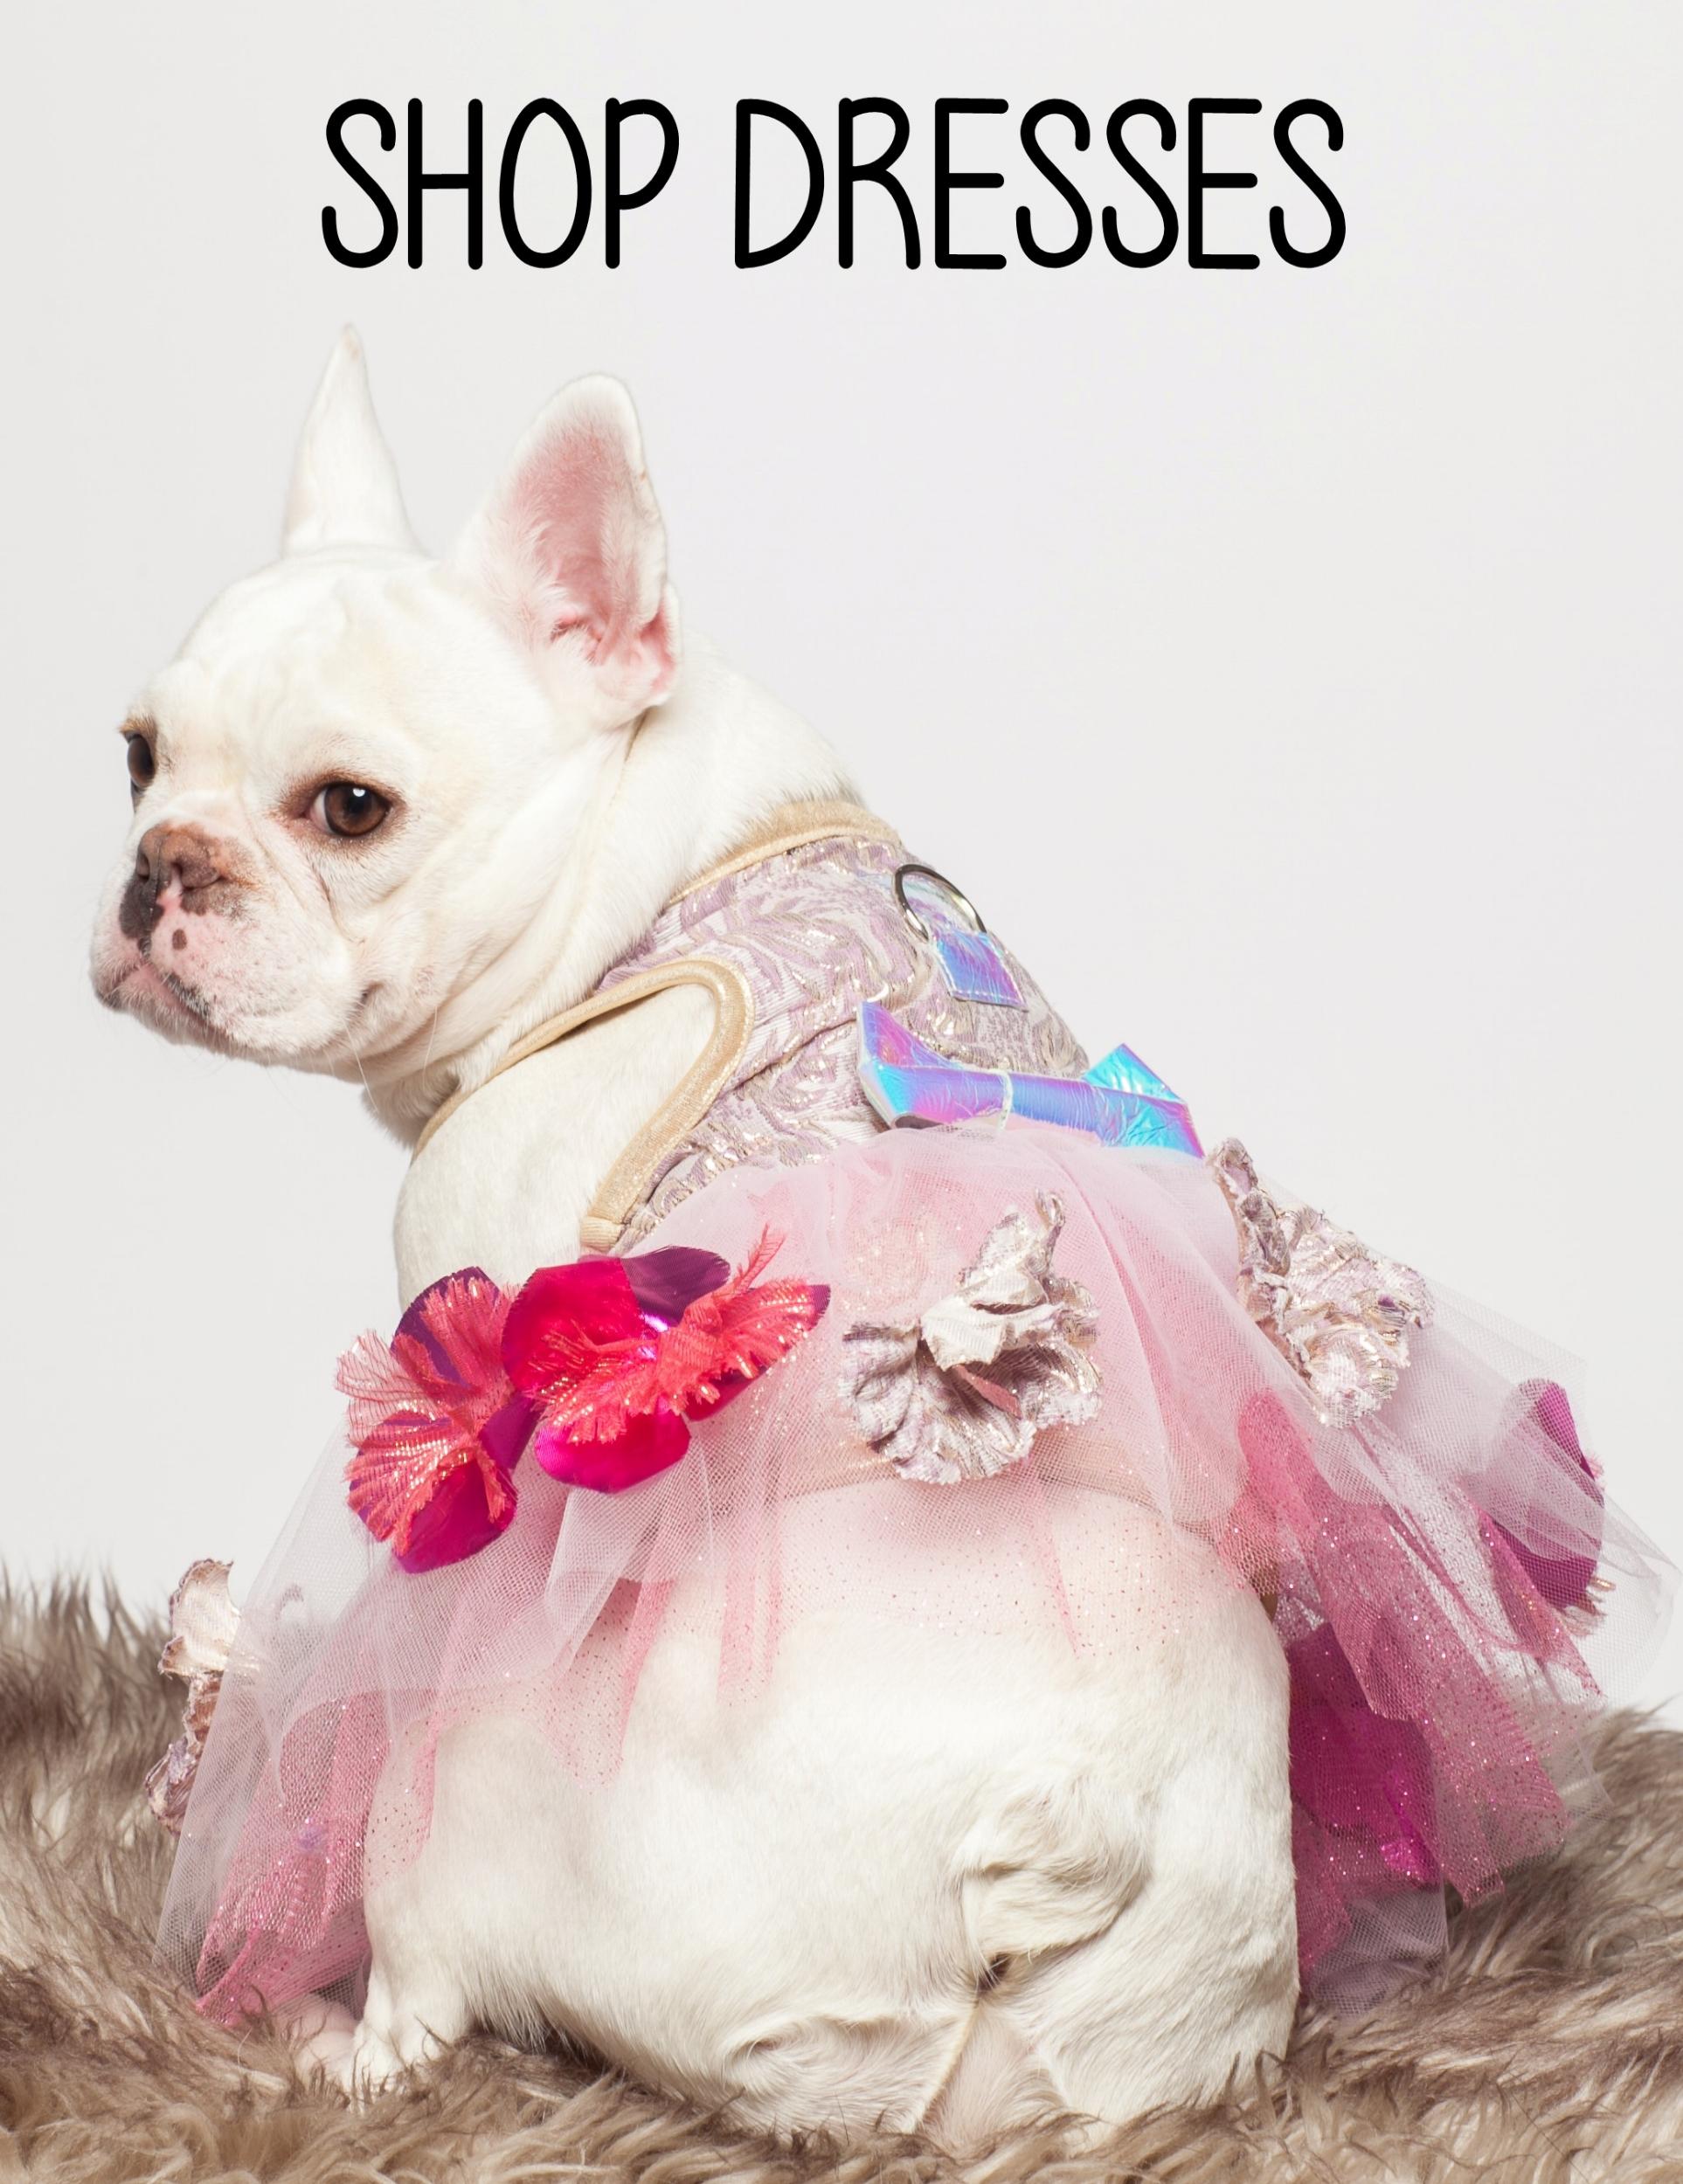 Shop dresses.jpg